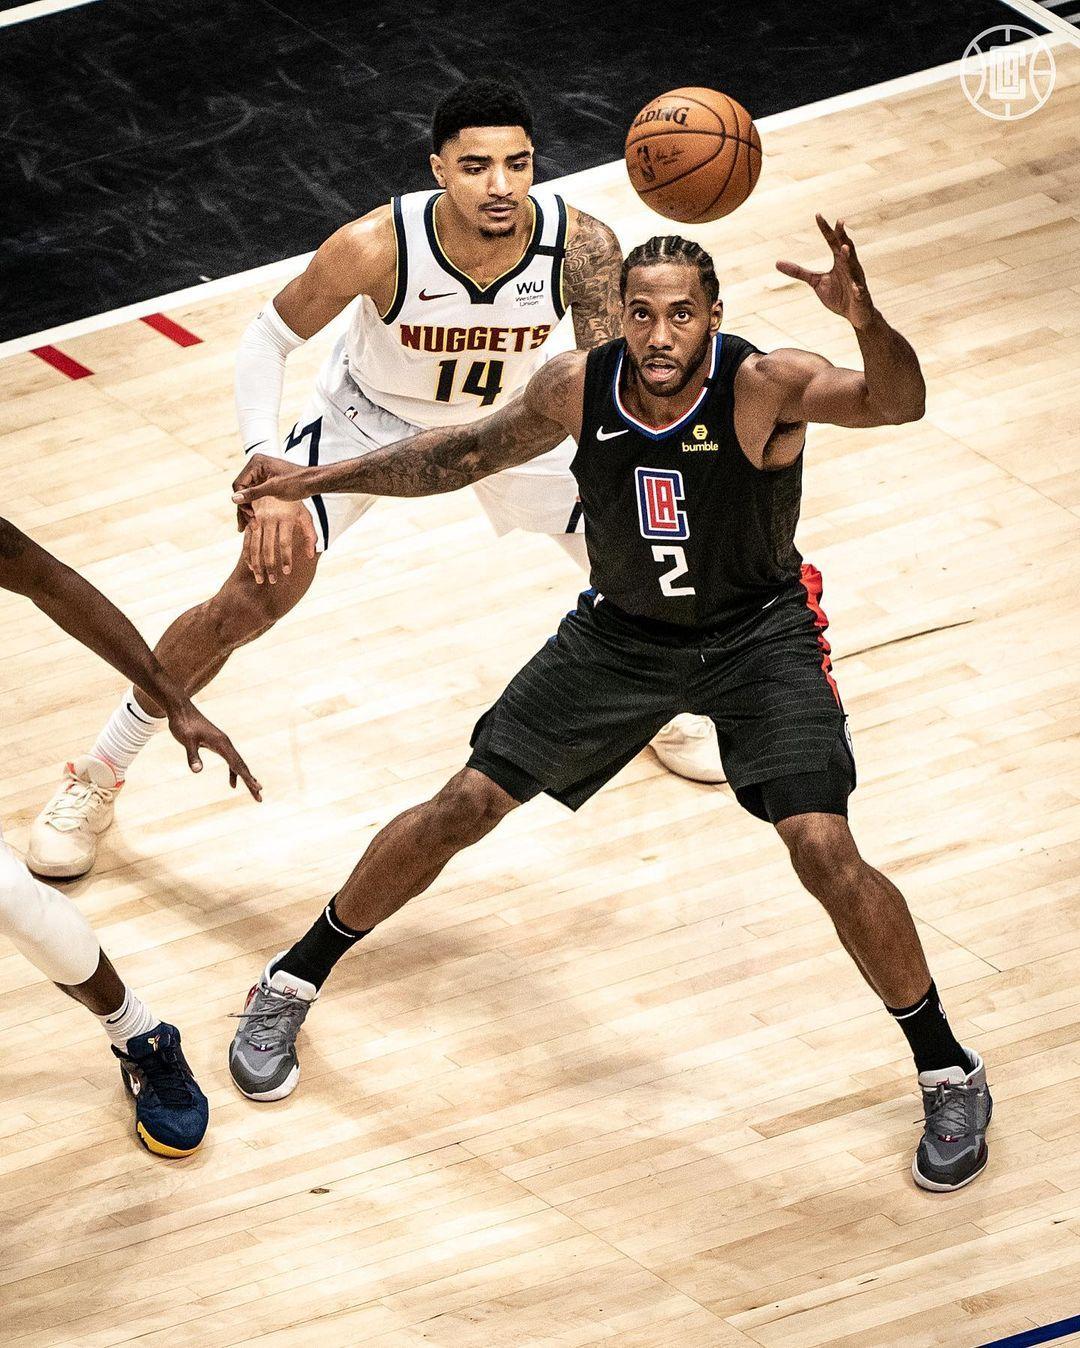 La Clippers On Instagram Got It Done Vs Denver